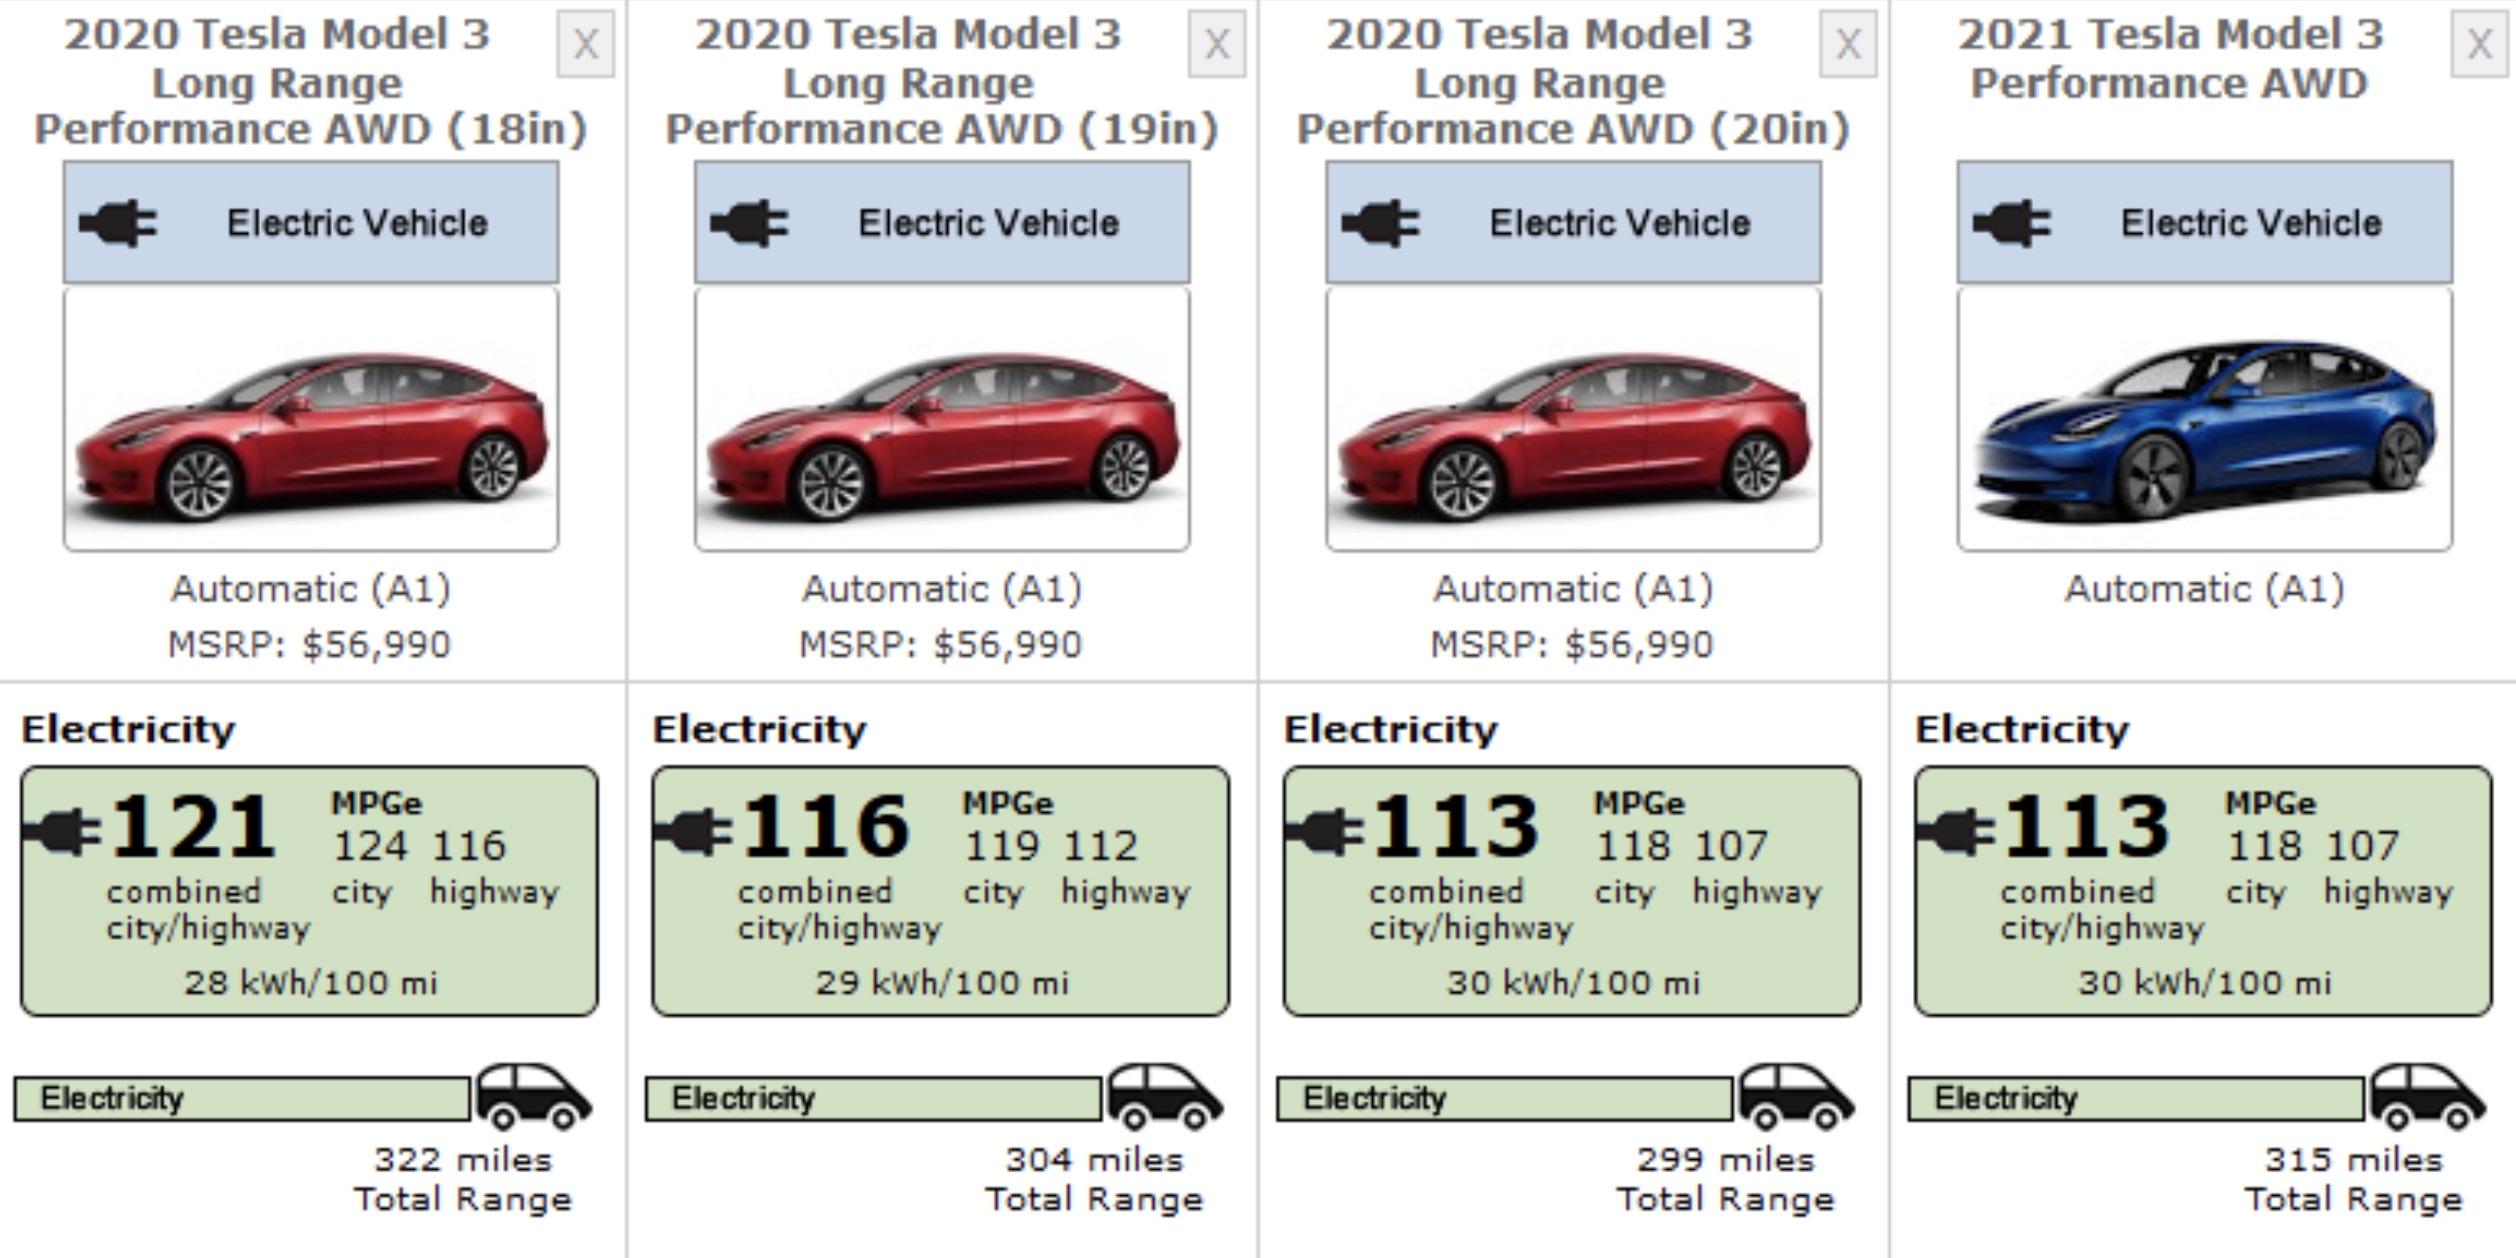 Tesla-Model-3-refresh-Performance-AWD-efficiency